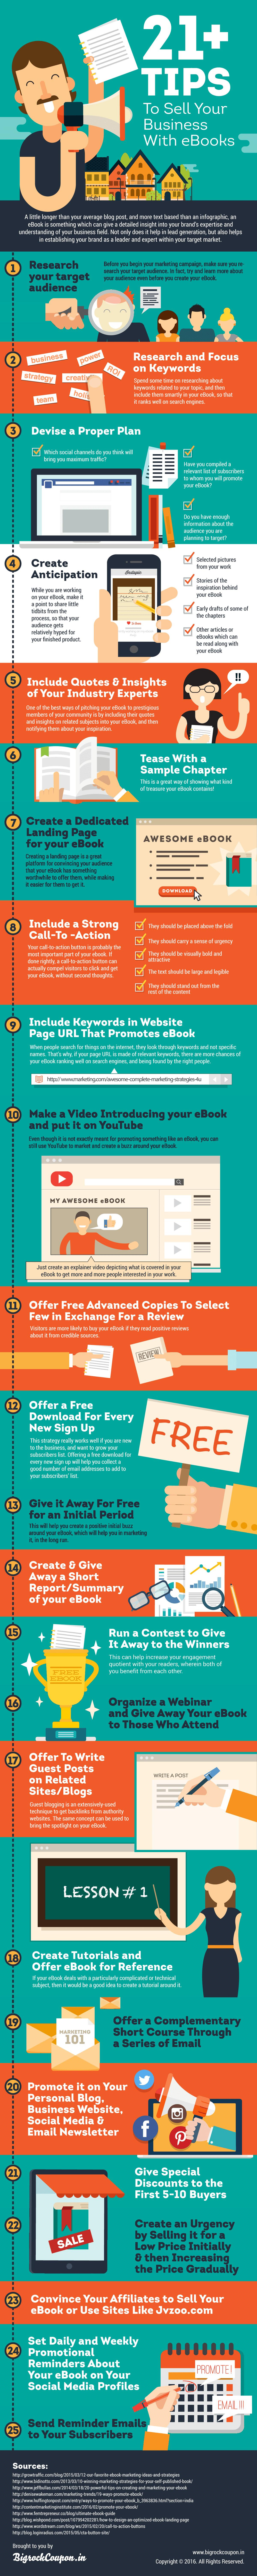 E-book-Marketing Infographic (1)